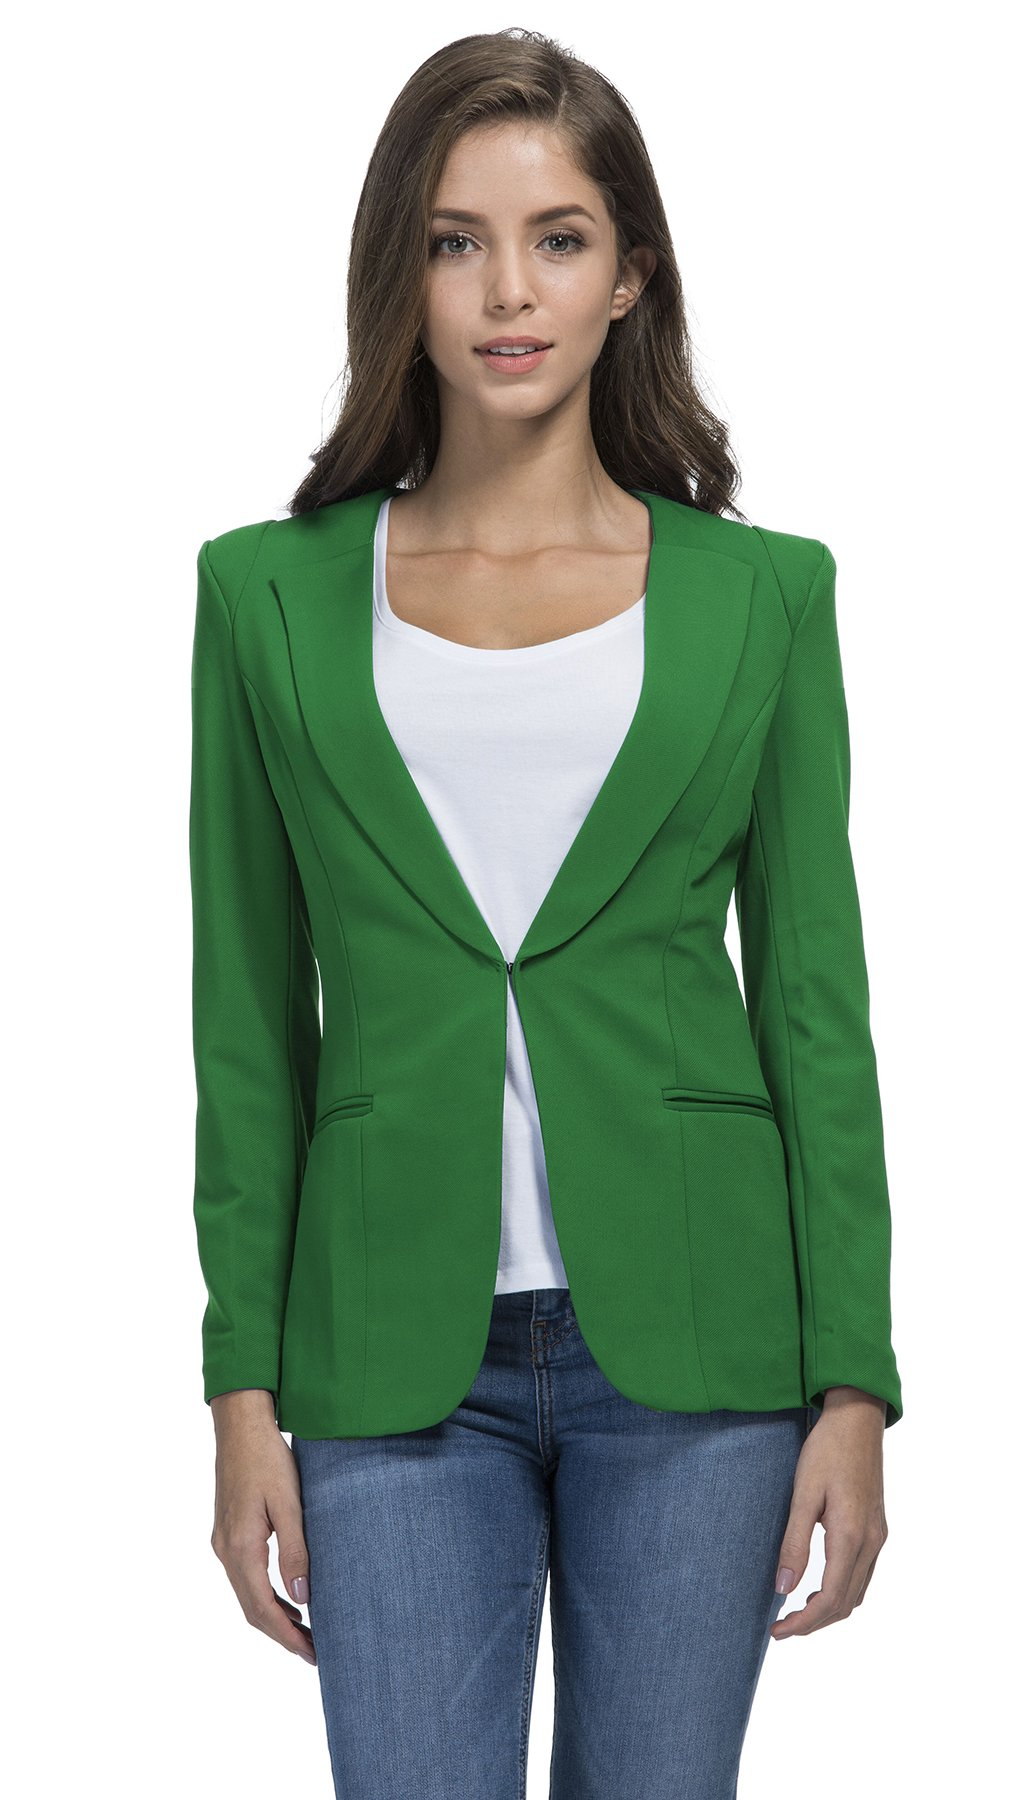 RubySports Women Clothing RS Womens Casual Basic Work Office Cardigan Tuxedo Blazer Boyfriend Jacket Green 4